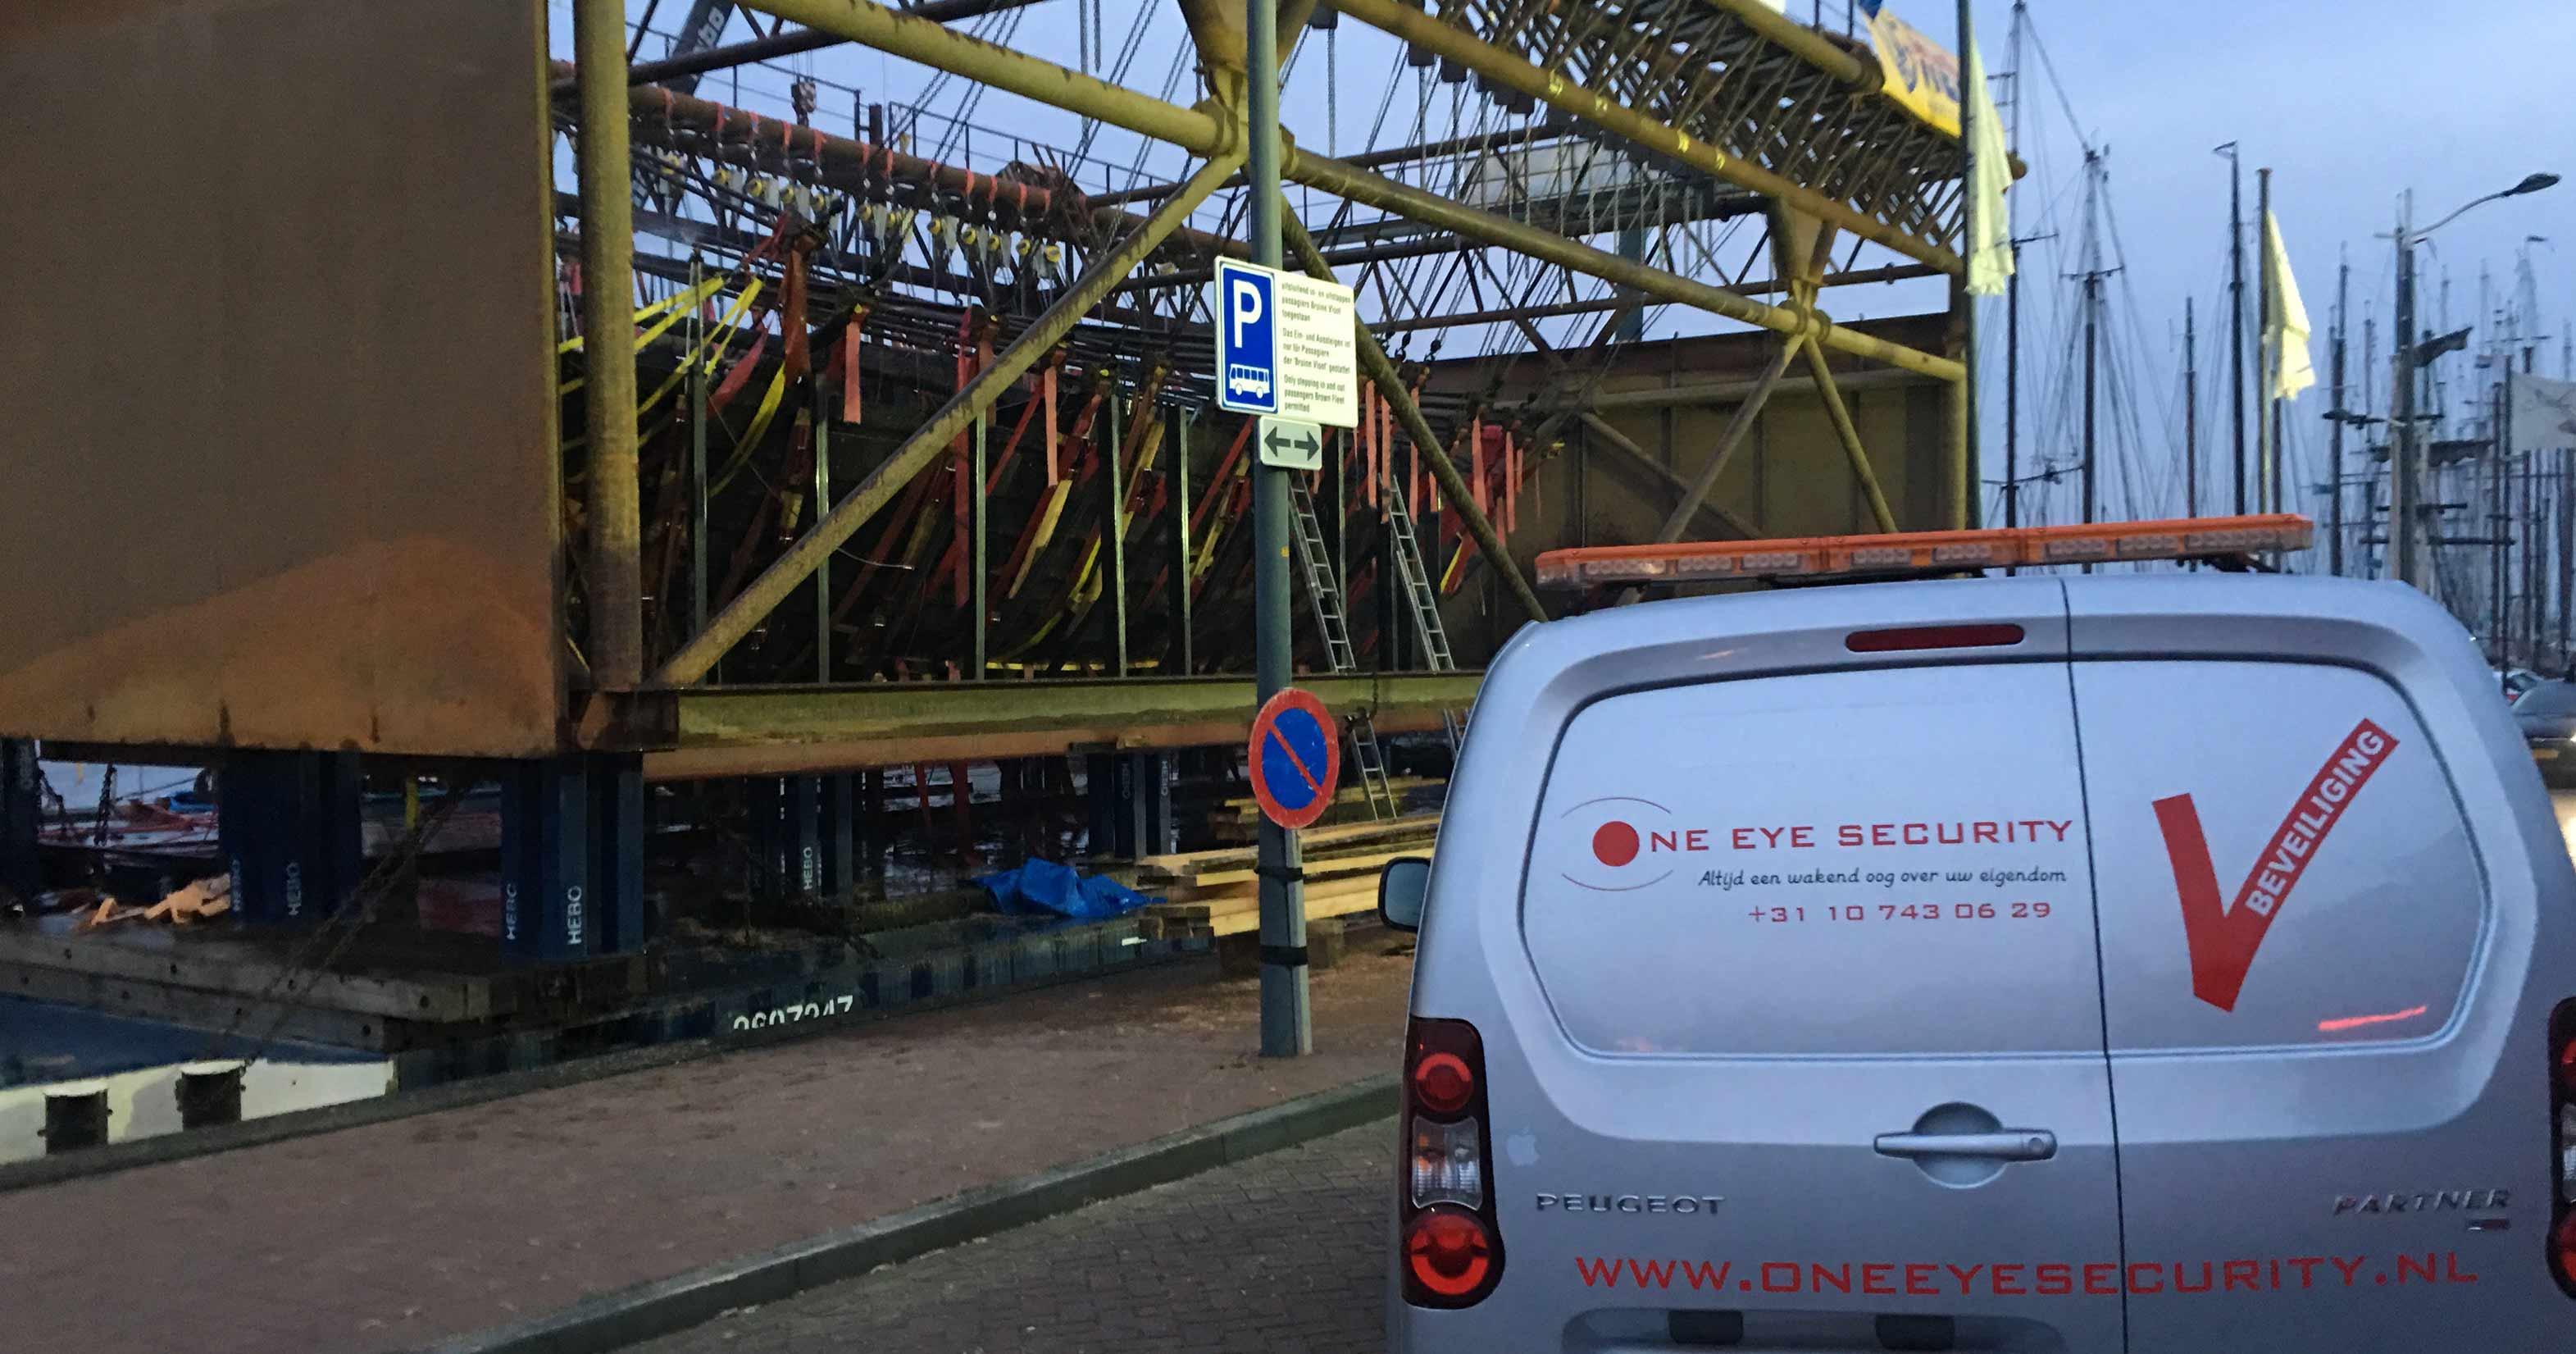 Kogge schip Kampen